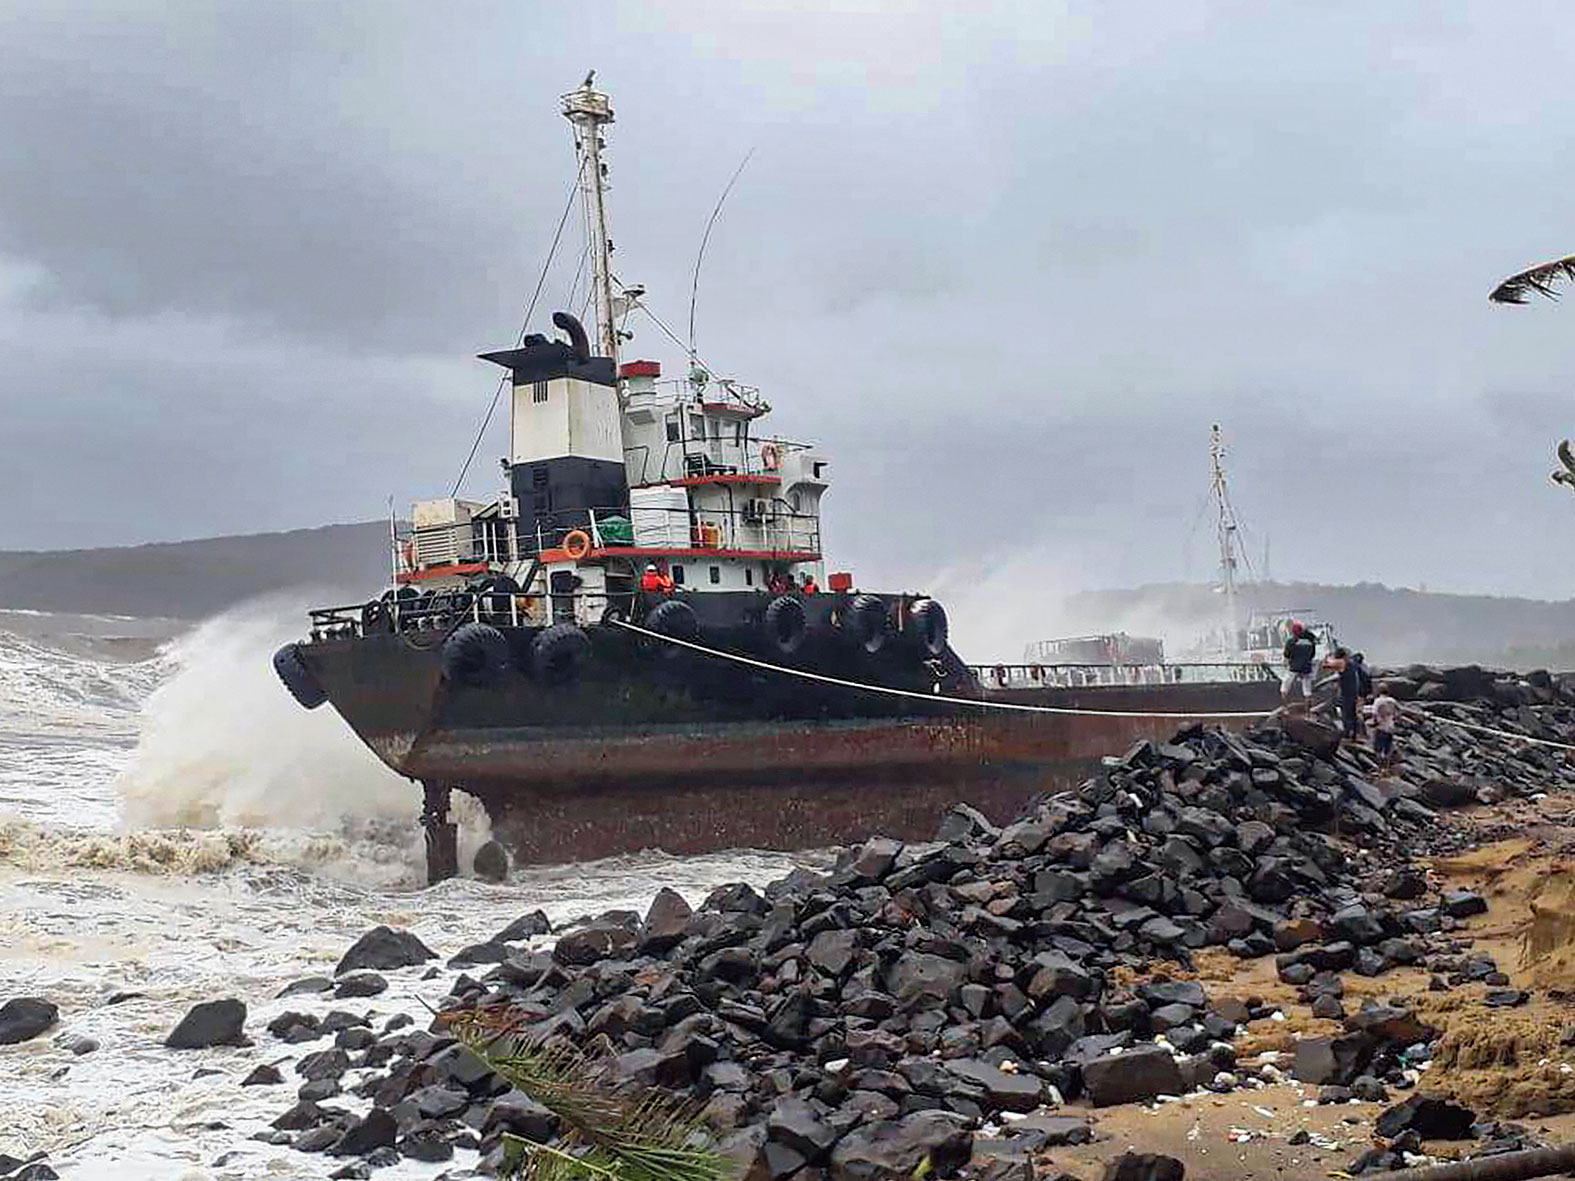 A wave strikes a vessel near Mirya embankment at Ratnagiri Narmada Cement Port.